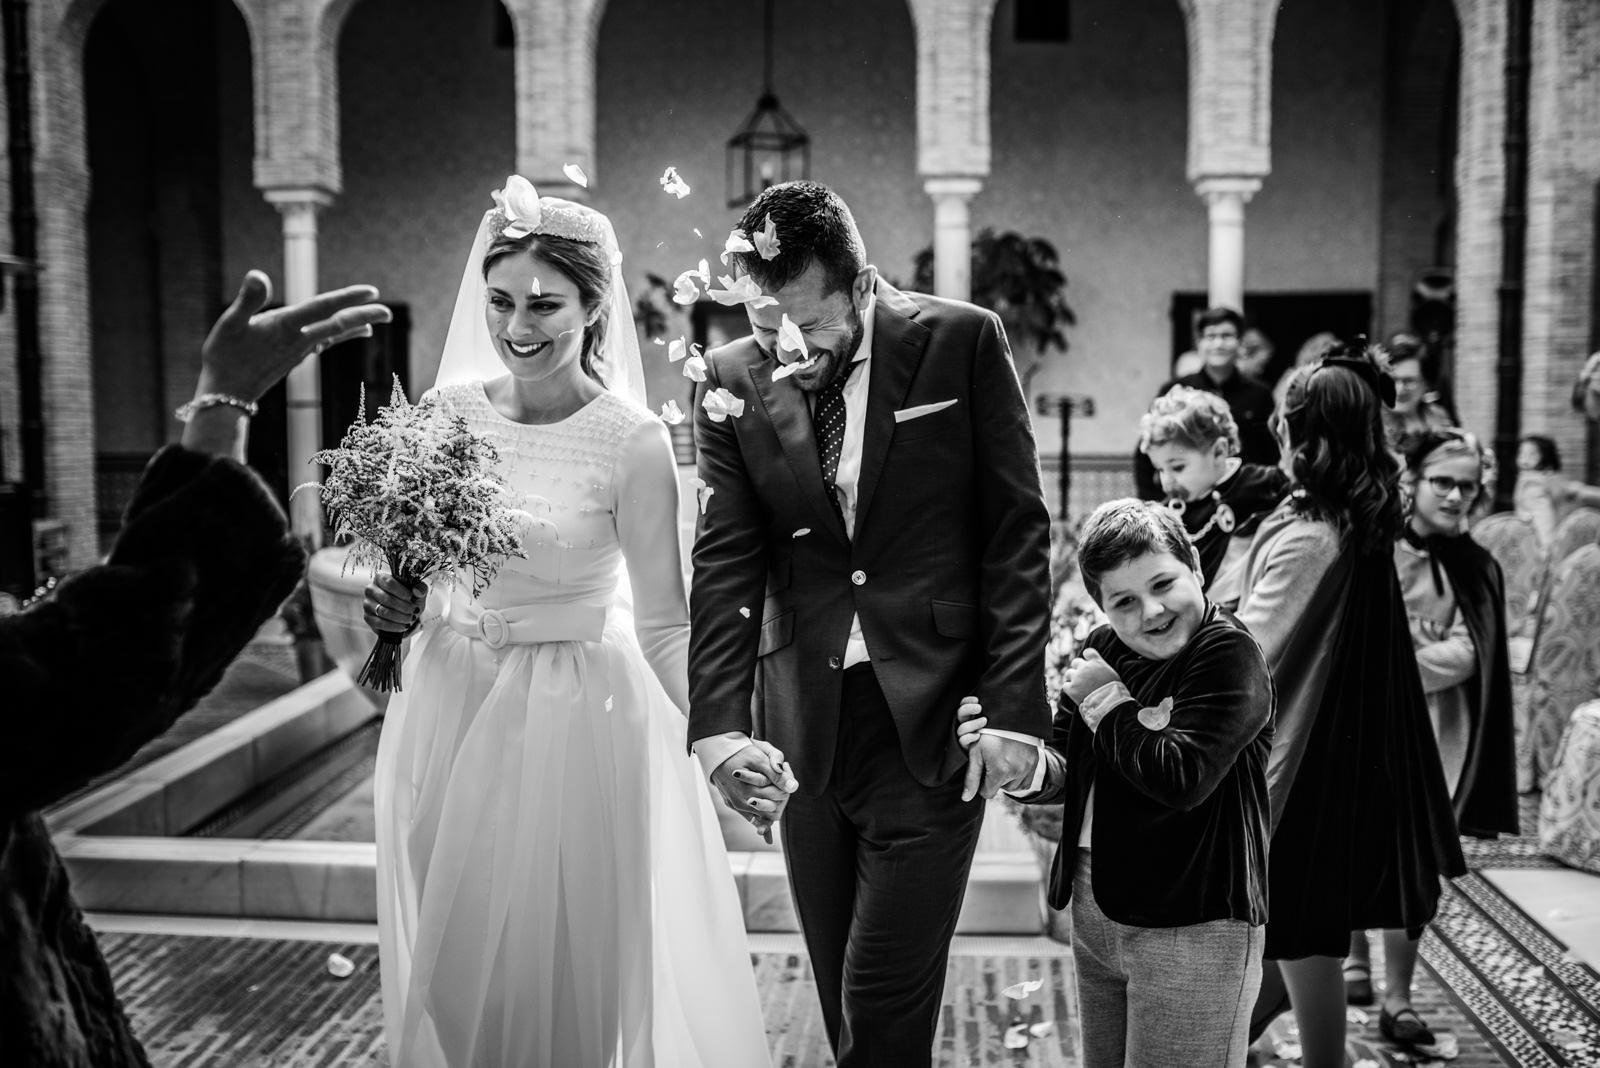 Boda-Sevilla-Parador-Carmona-bridal-engagement-Rafael-Torres-fotografo-bodas-sevilla-madrid-barcelona-wedding-photographer--47.jpg